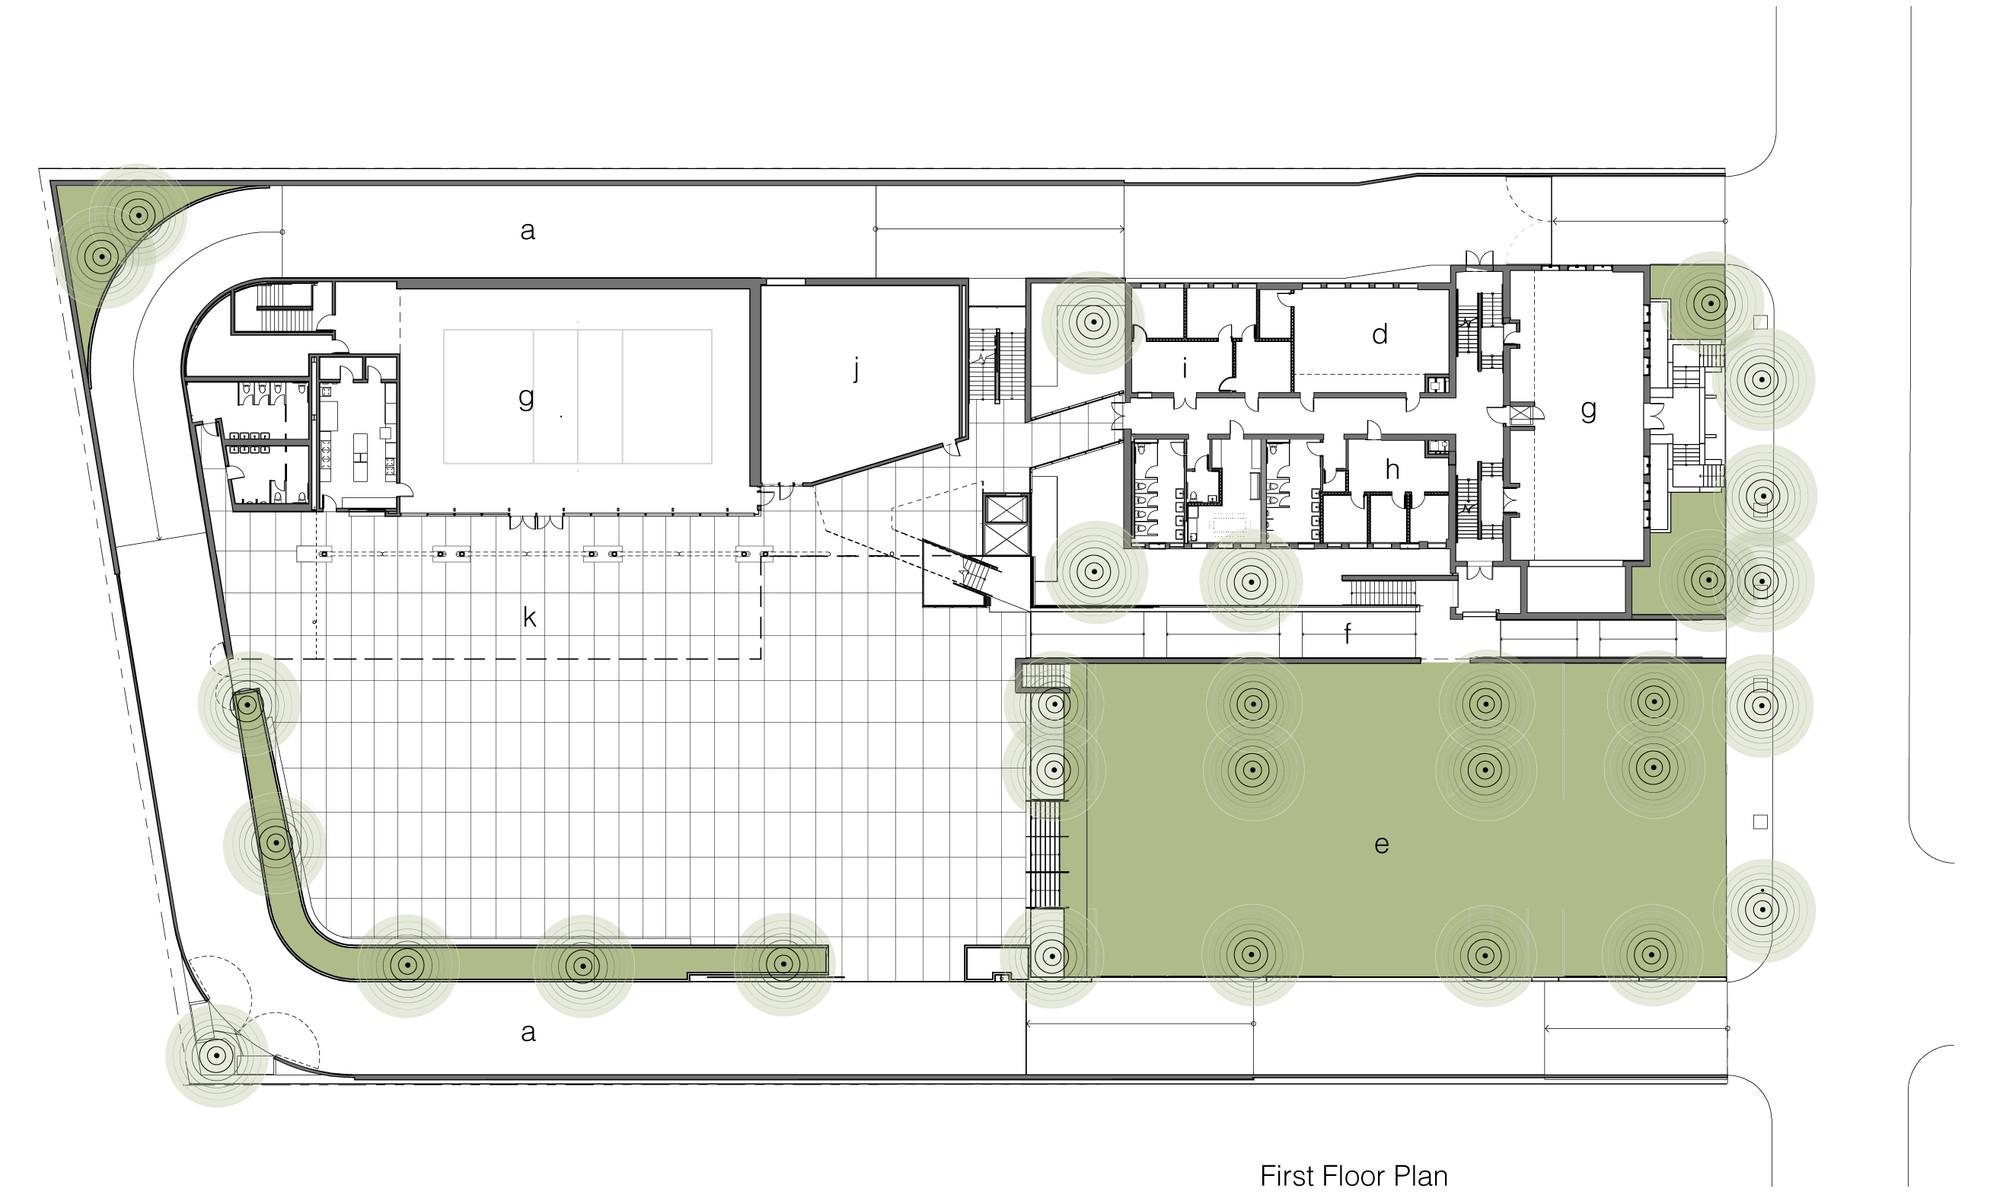 St. Thomas the Apostle School / Griffin Enright Architects